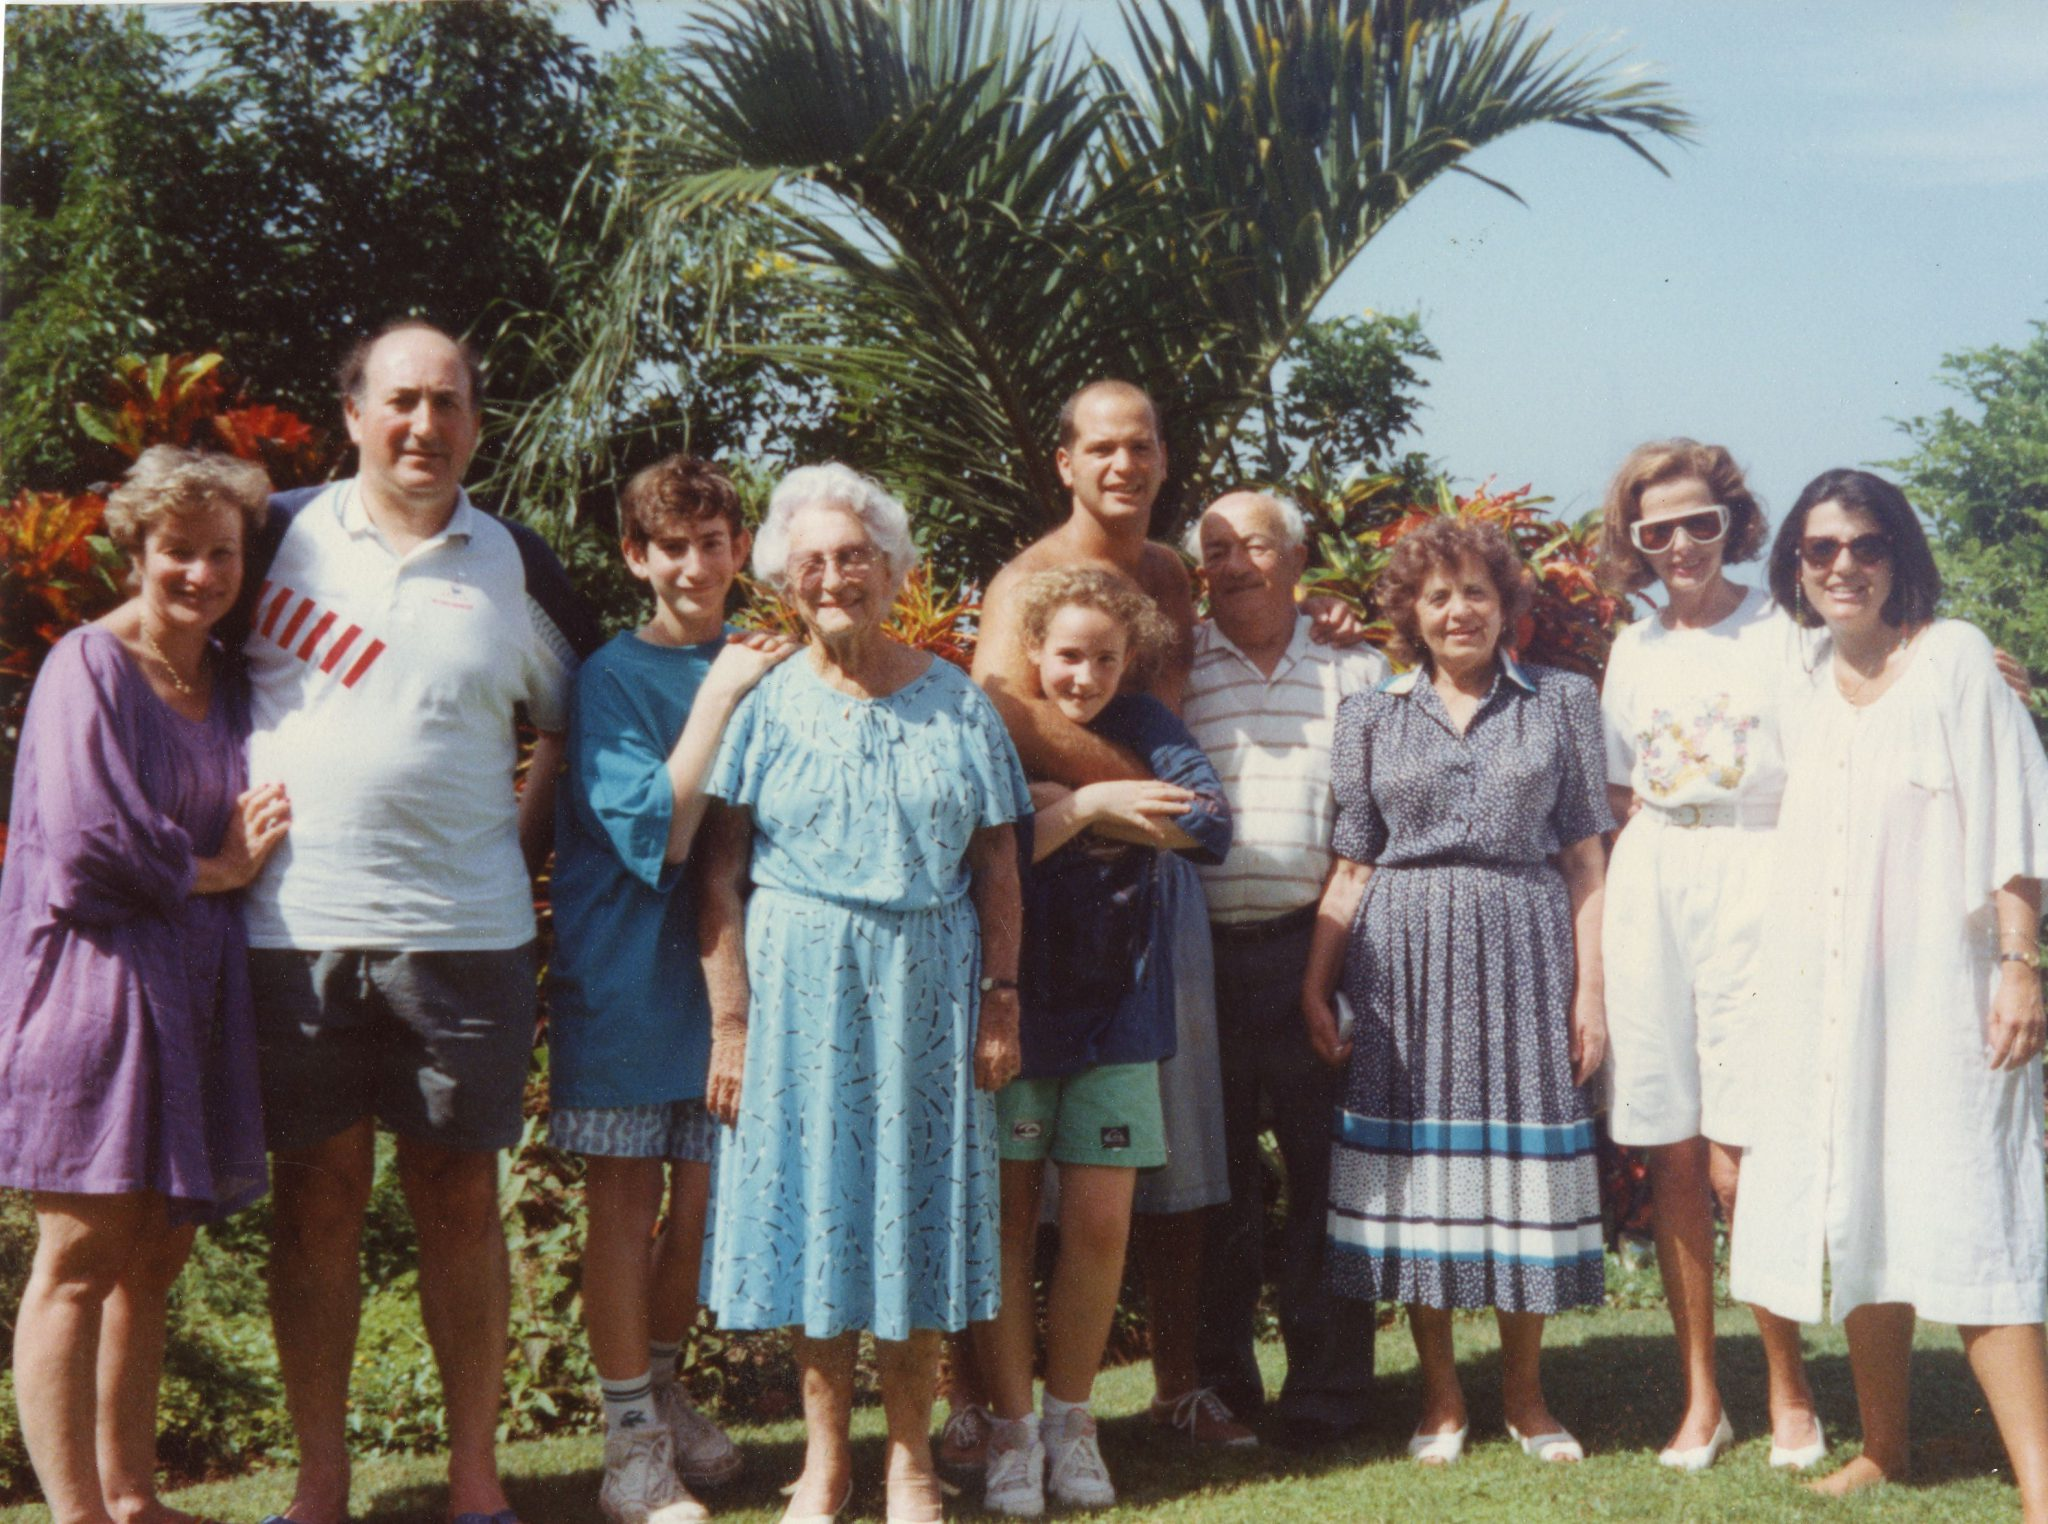 The Ditz family